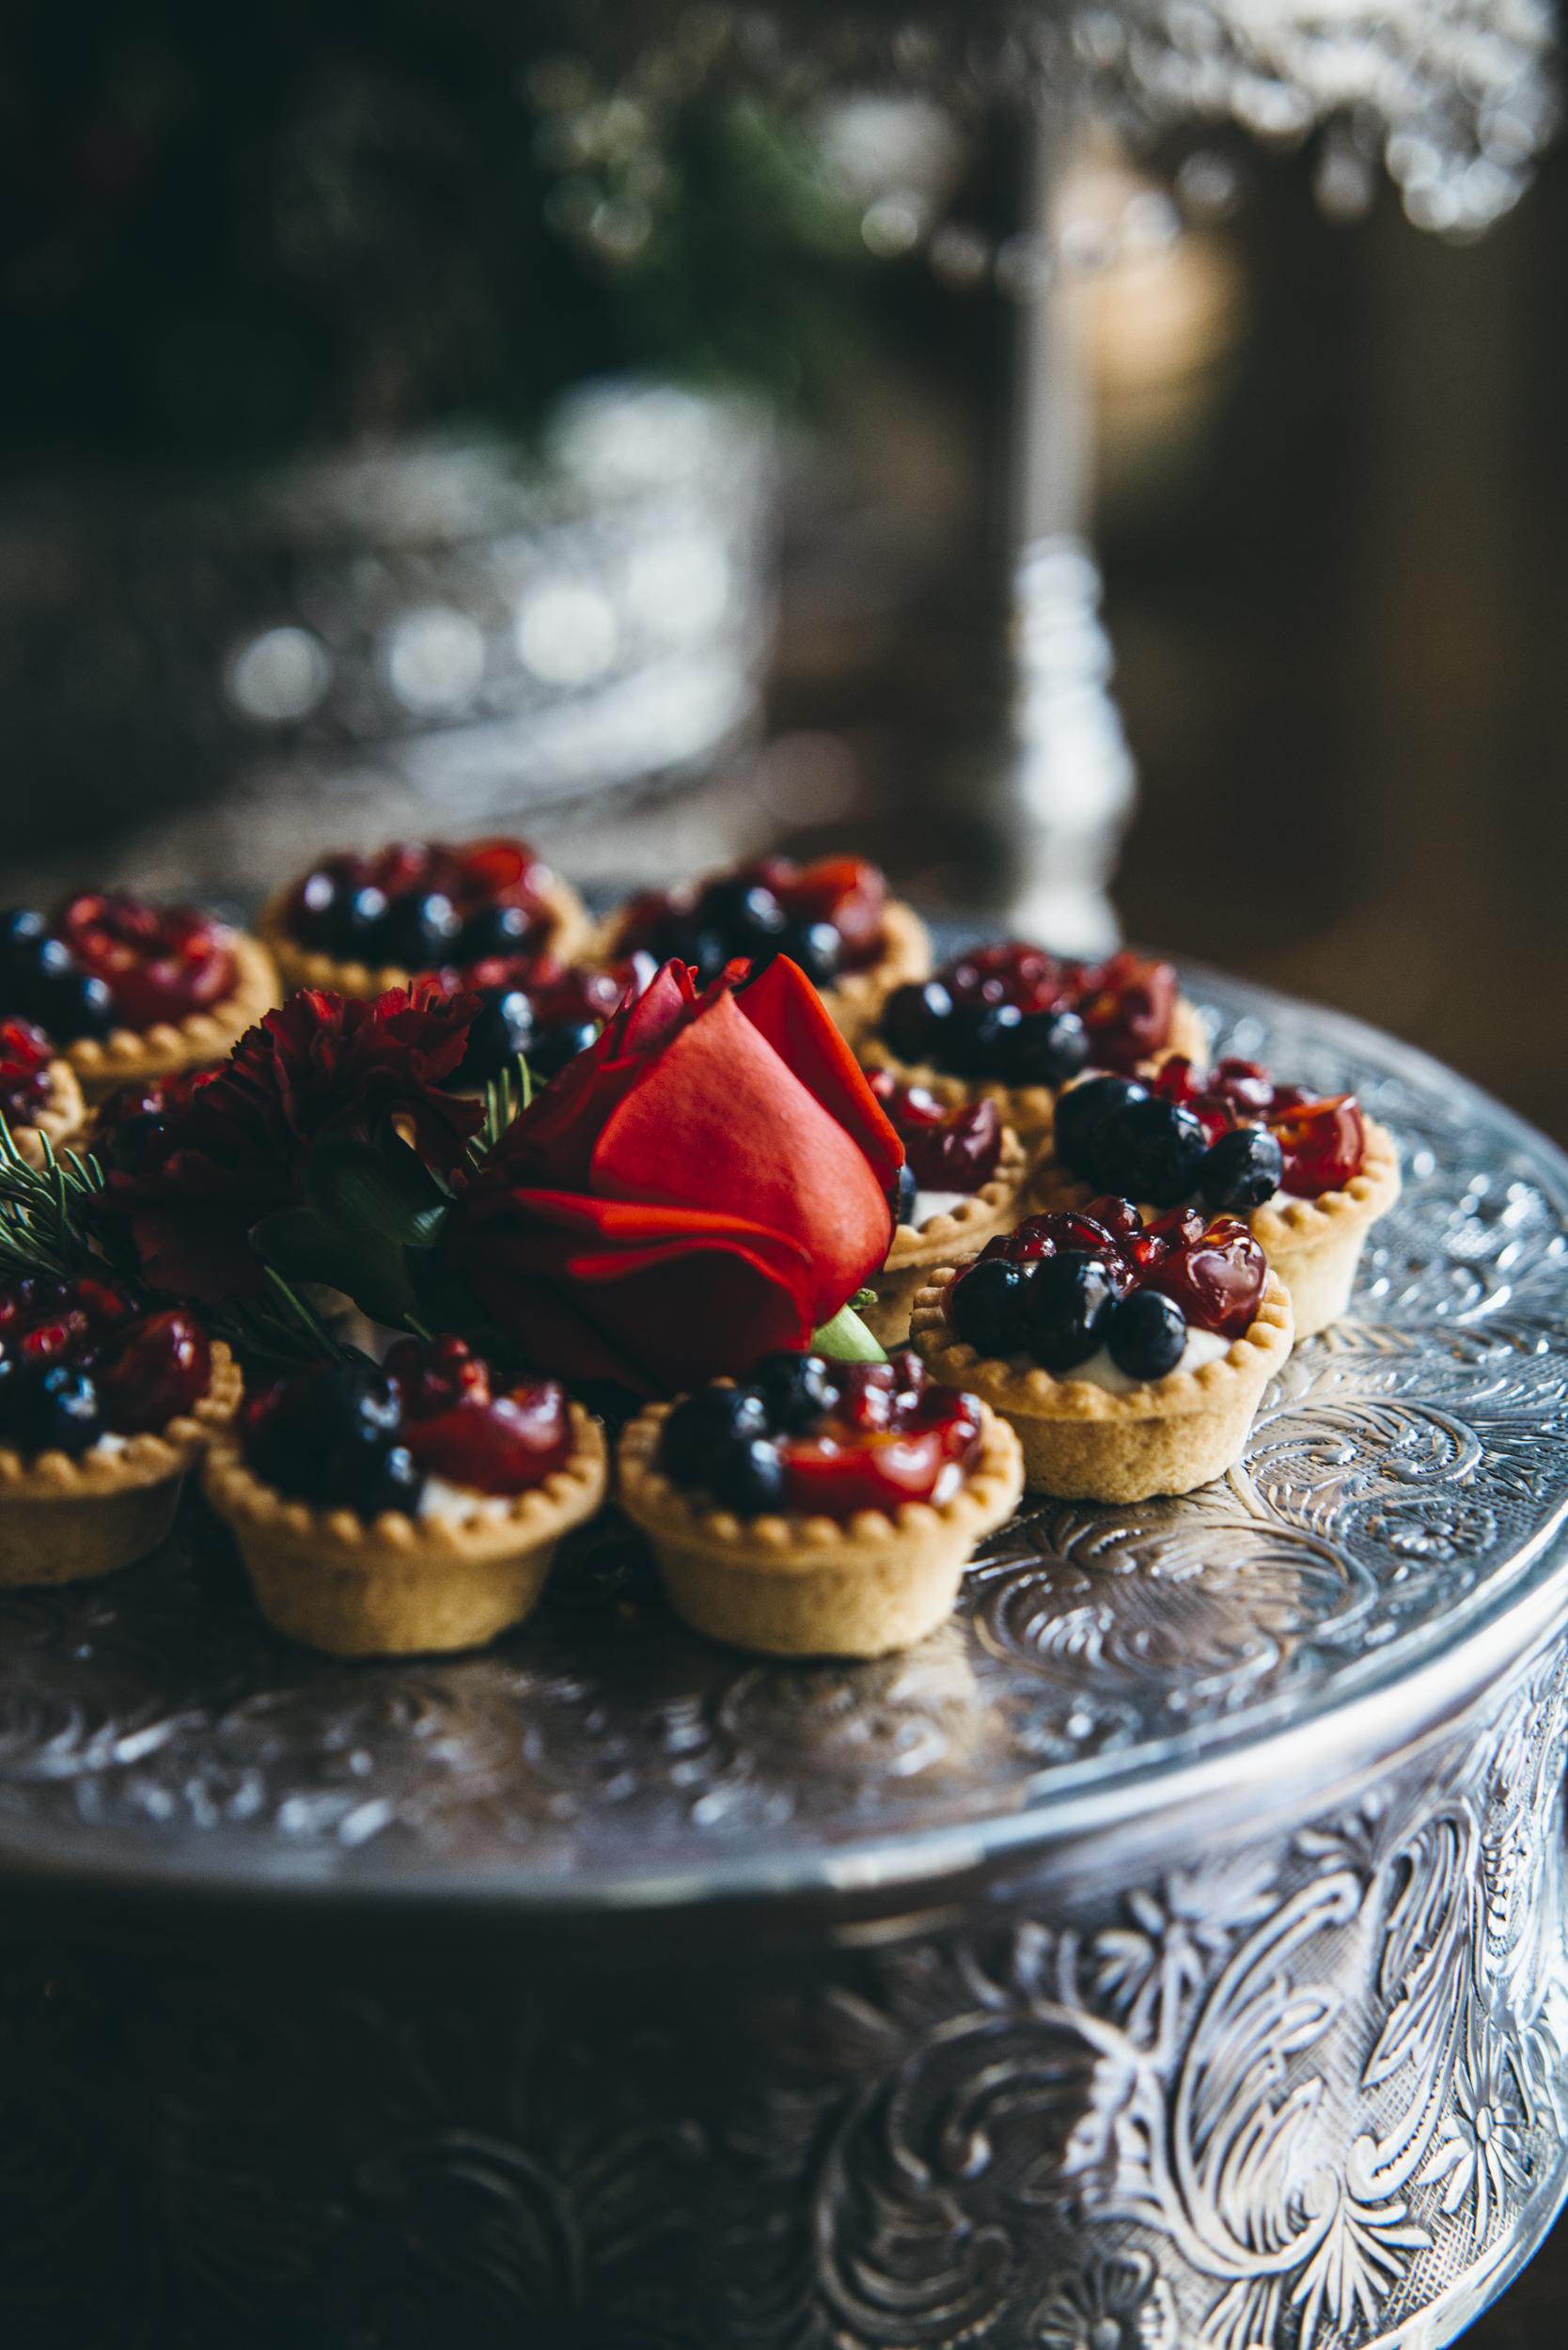 Fruit tarts - – vanilla bean, pastry cream, fresh berries, apricot glaze